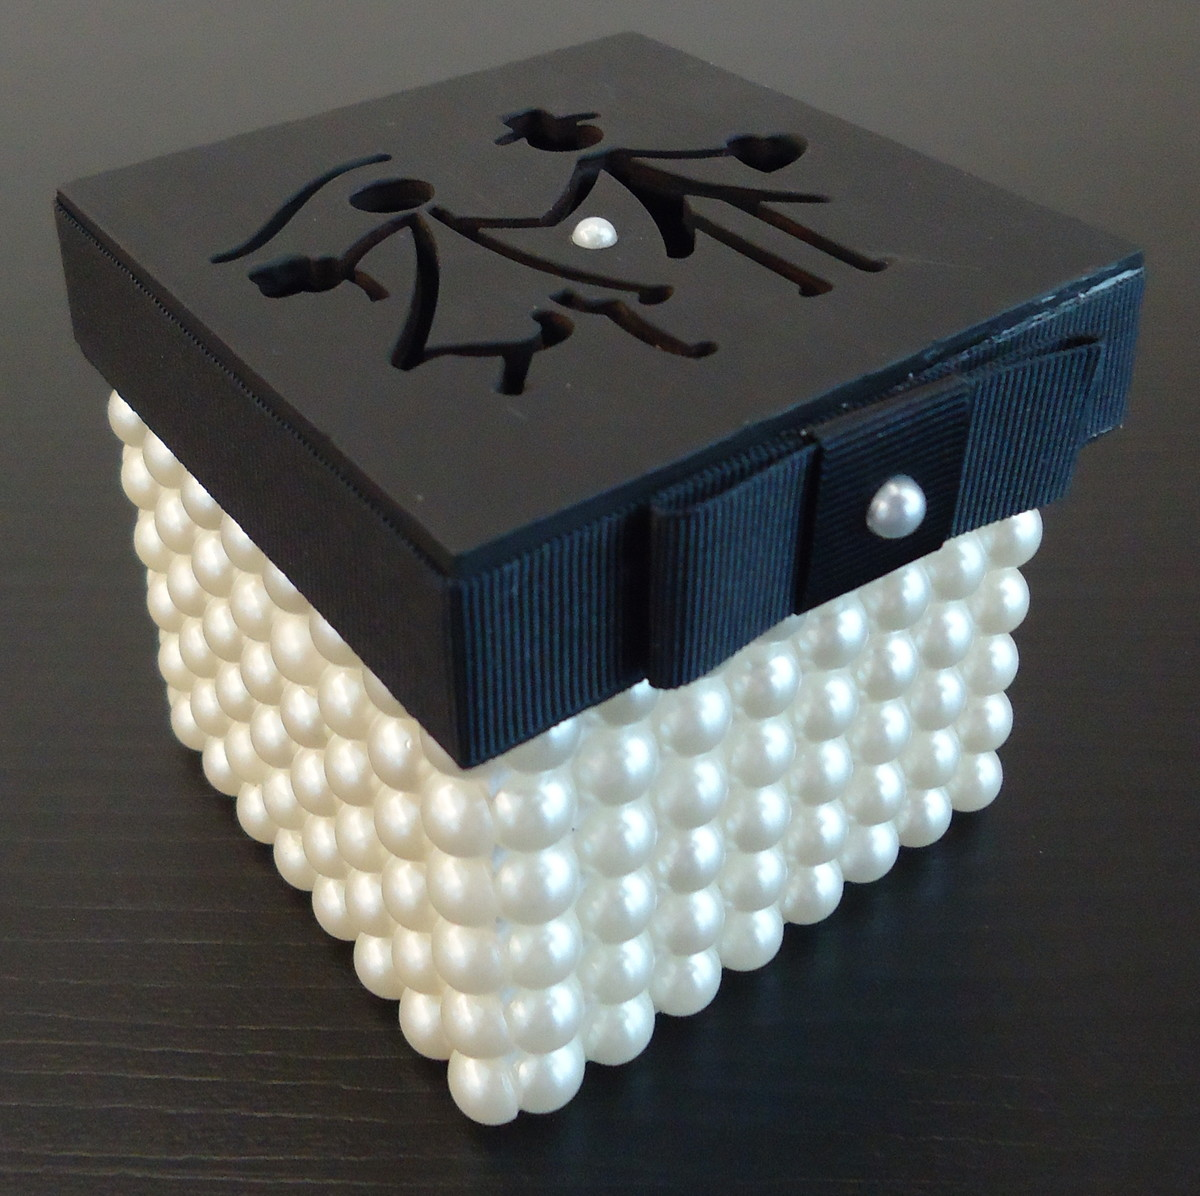 caixa tampa sapato perolas x cm caixa tampa sapato caixa tampa sapato  #33495B 1200x1196